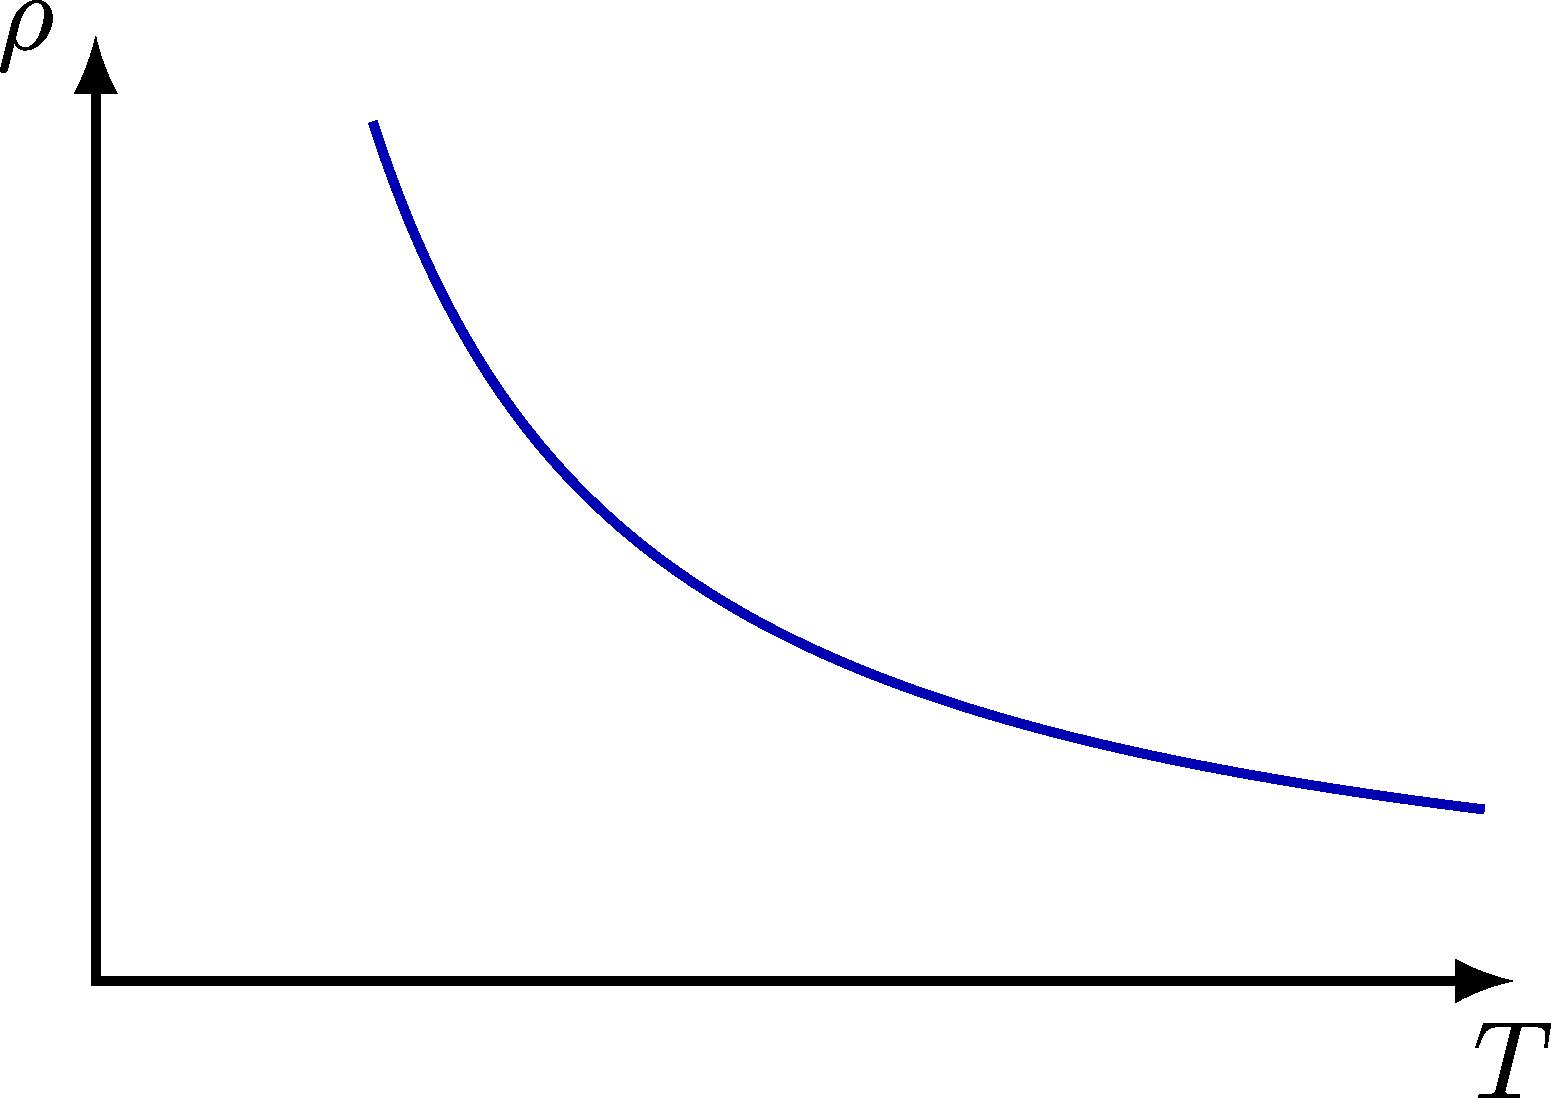 electric_circuit_plots-003.png